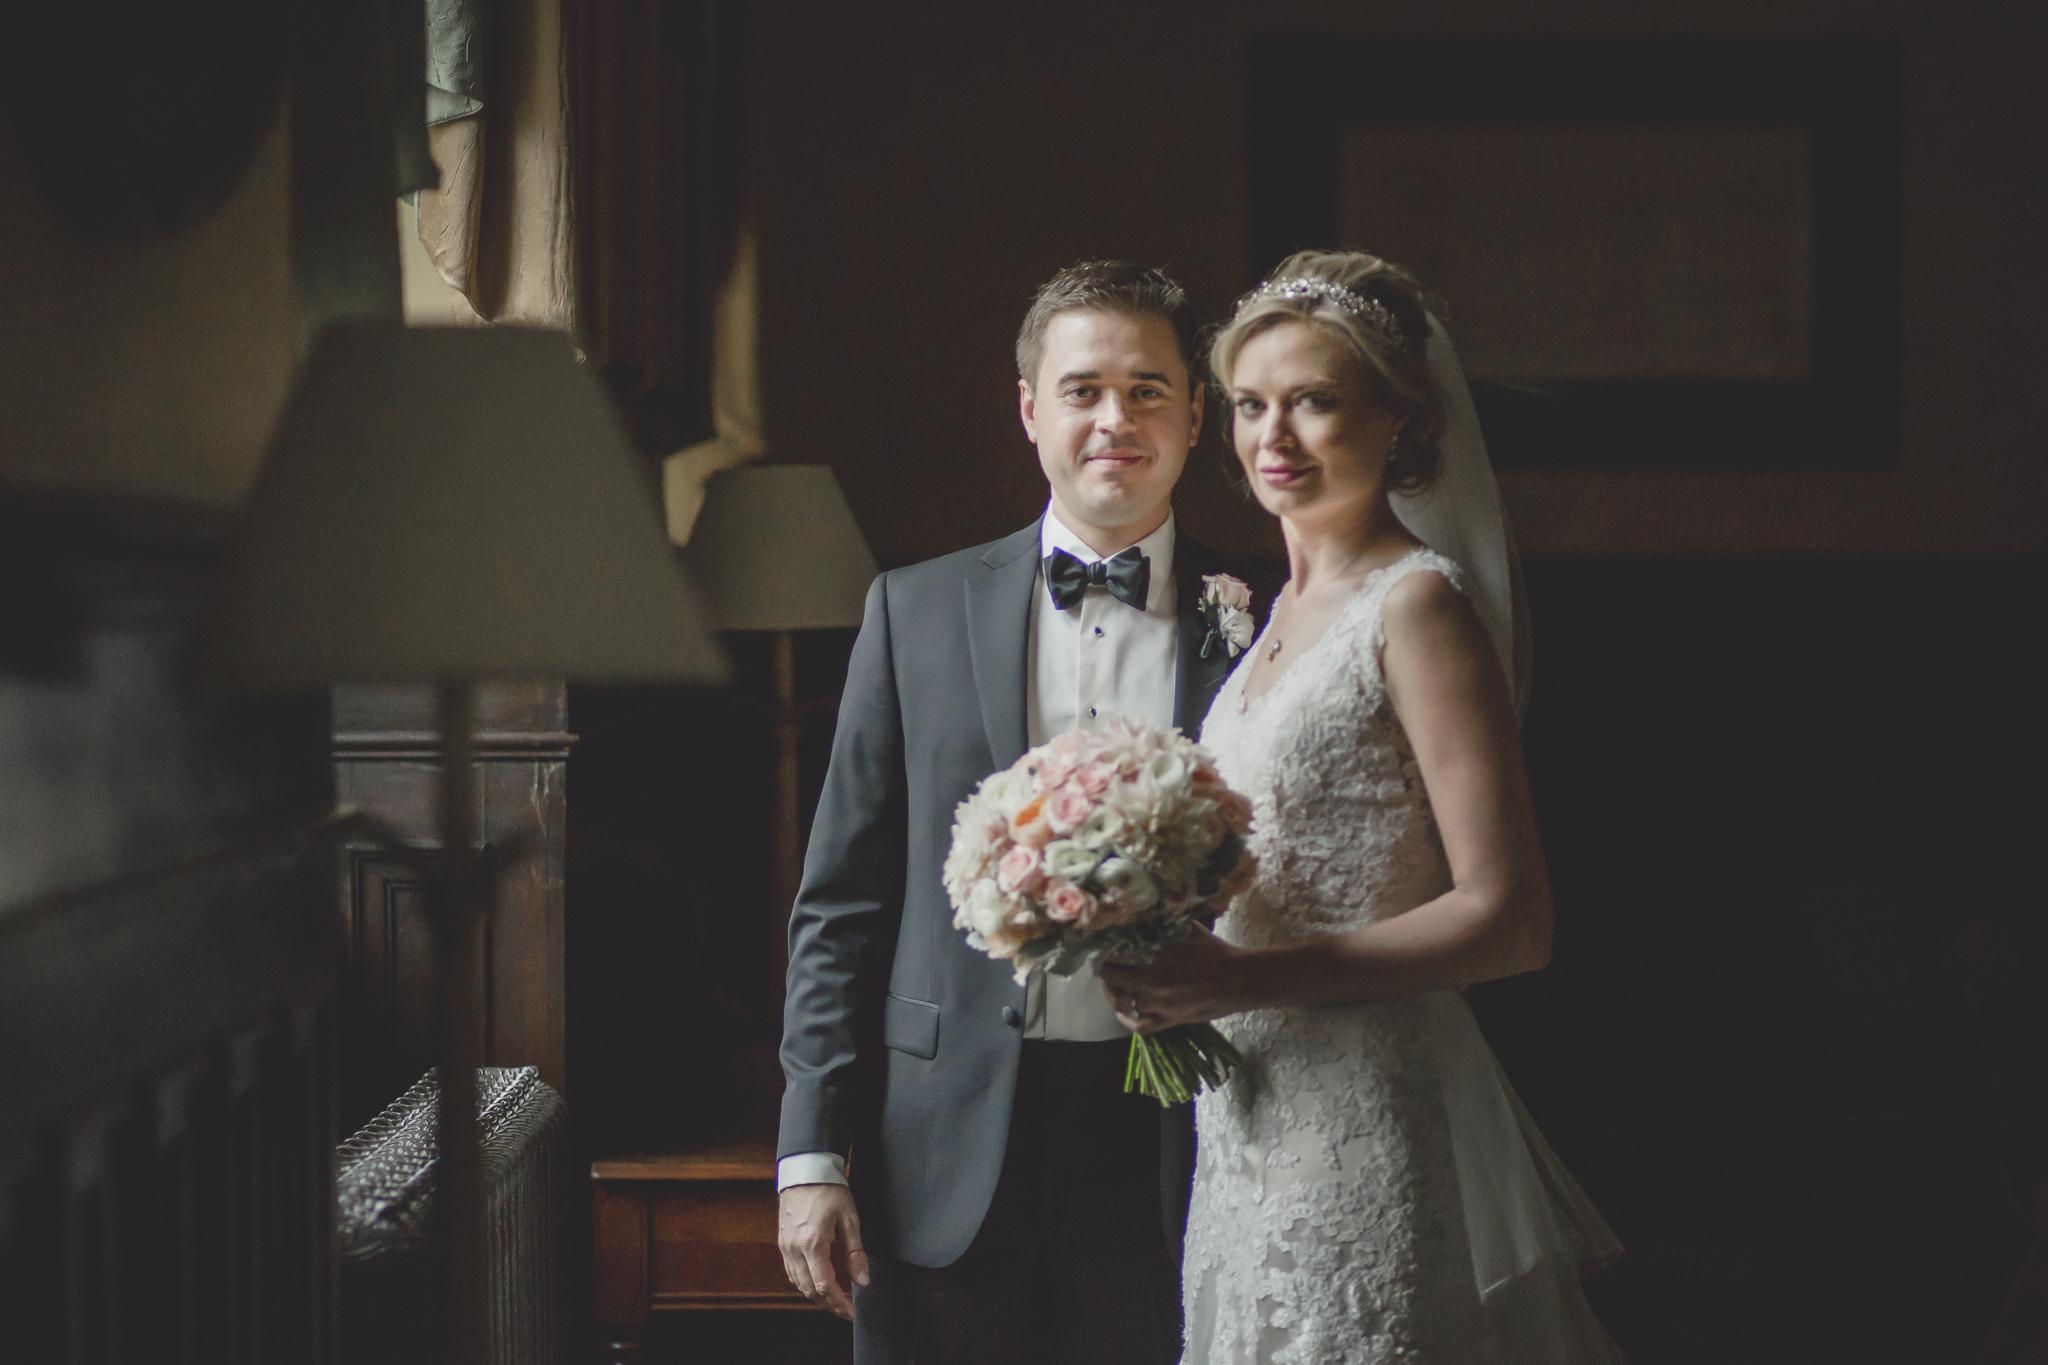 depot renaissance minneapolis wedding photography-24.jpg